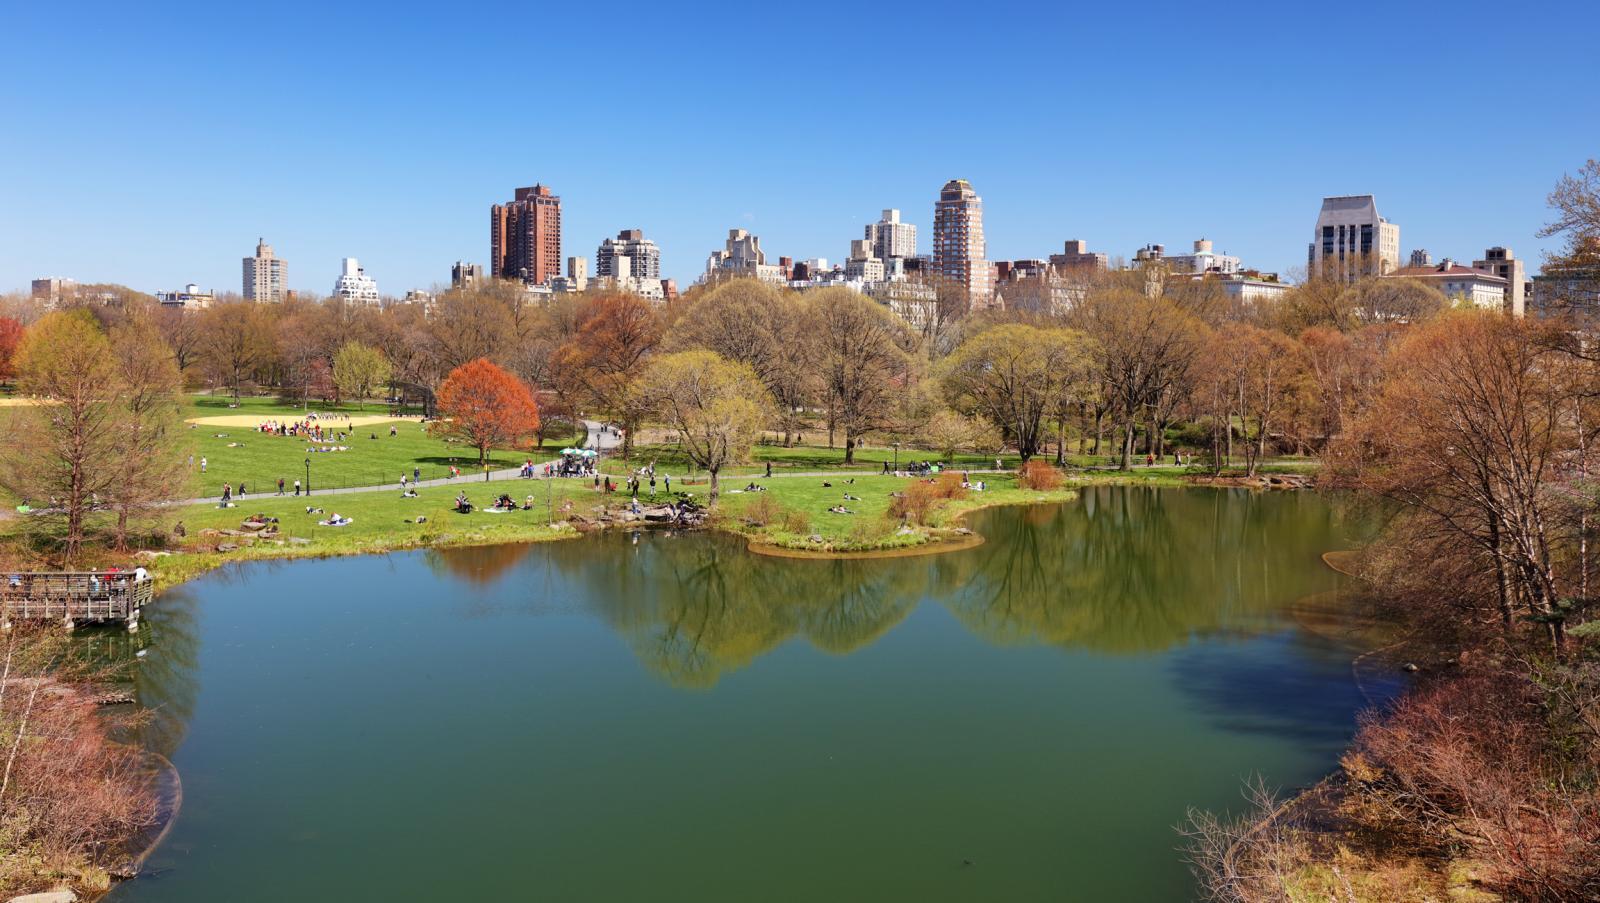 Turtle Pond at Central Park